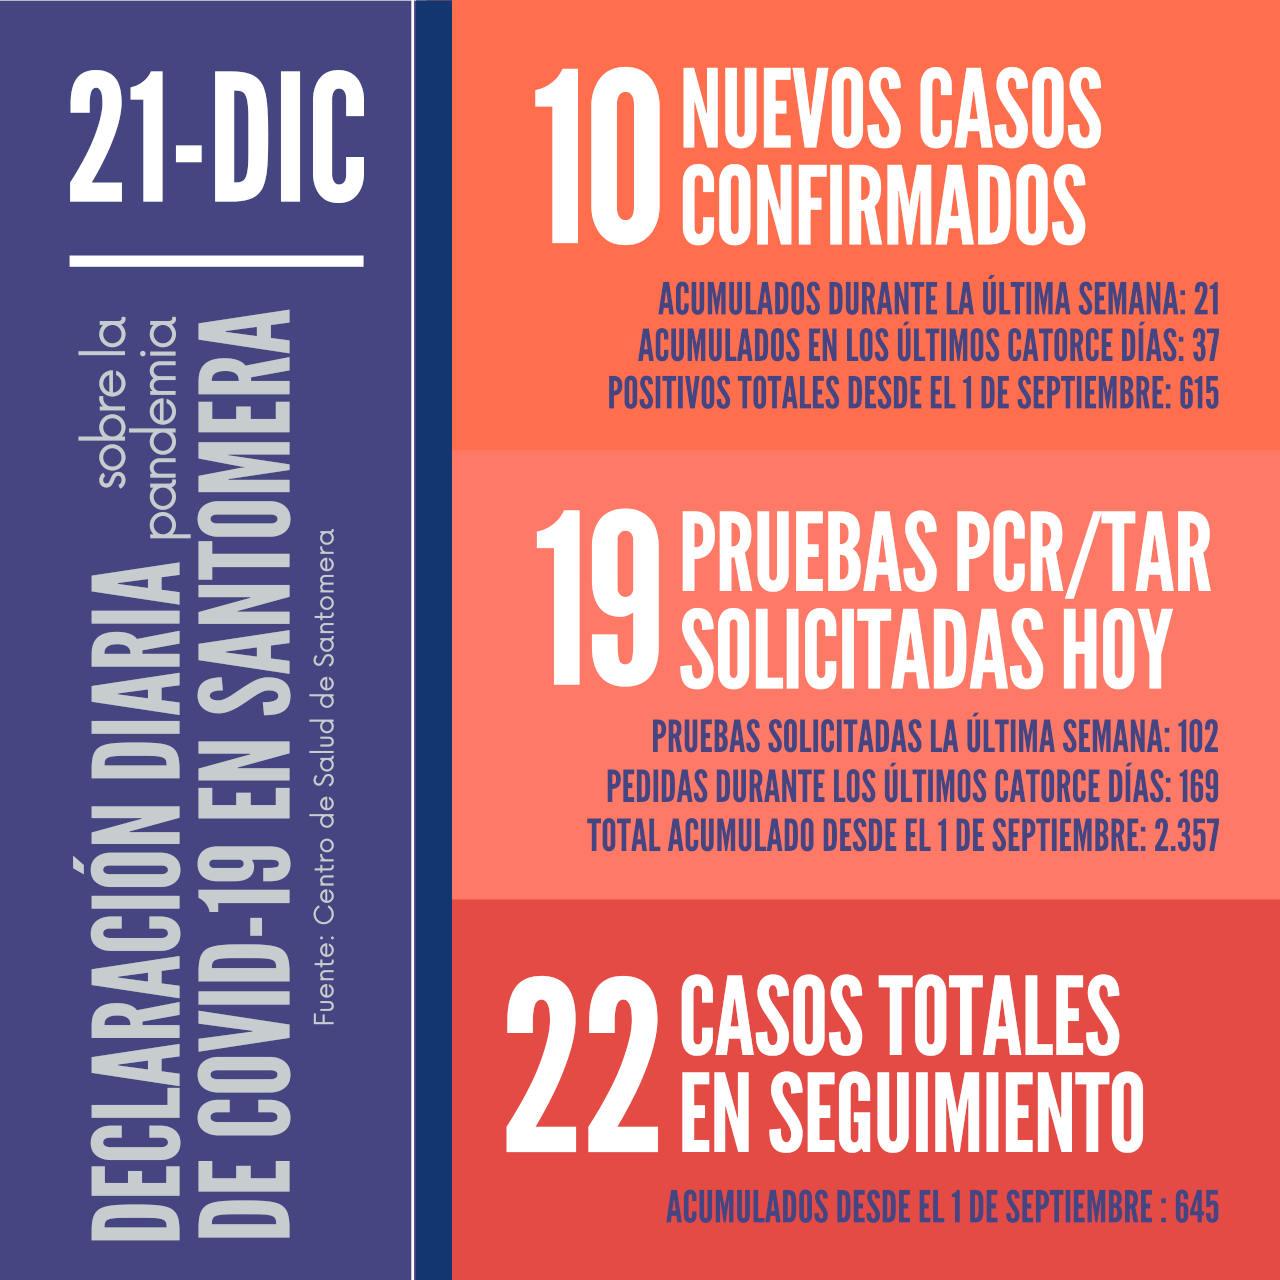 20201221_Datos COVID-19 Santomera